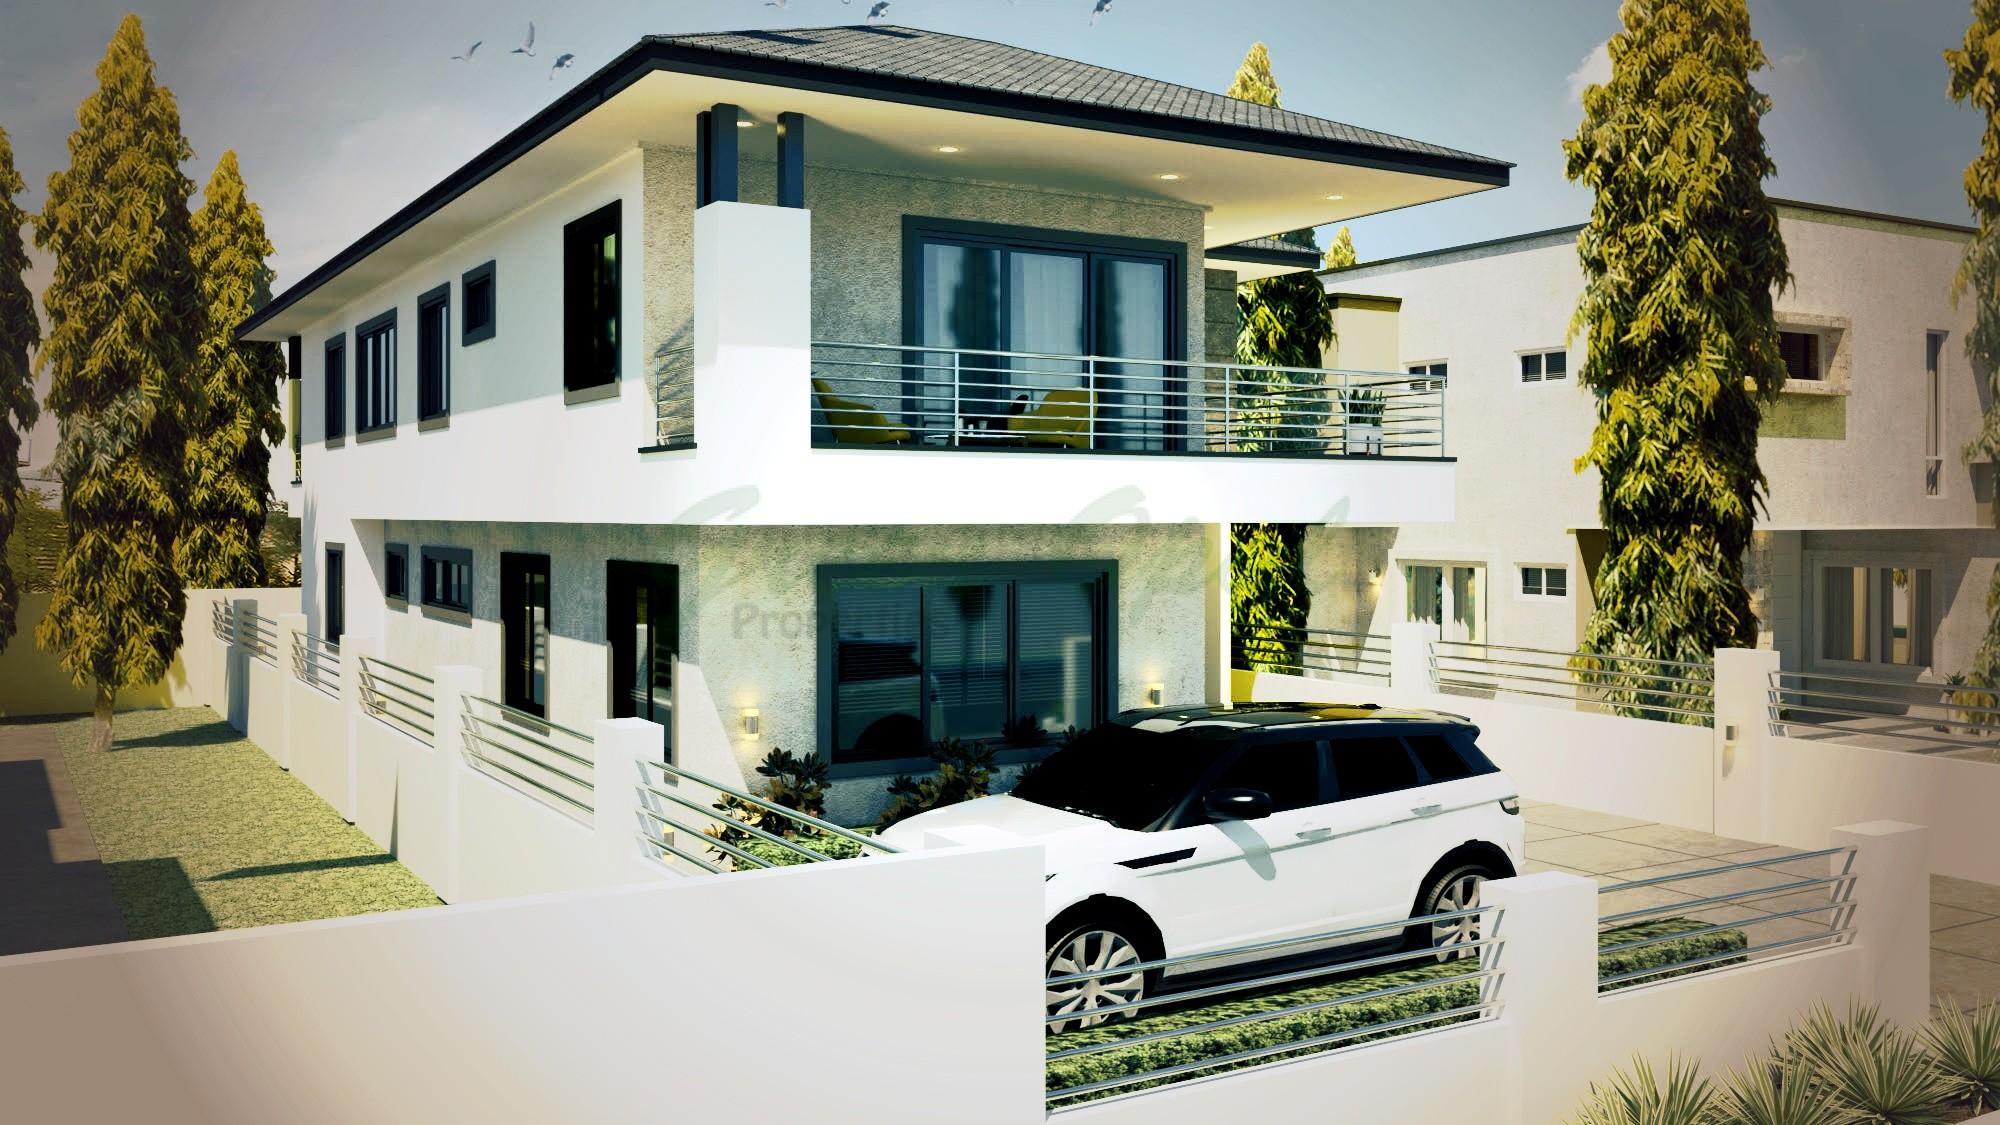 Green Opal Ghana 5 bedroom house